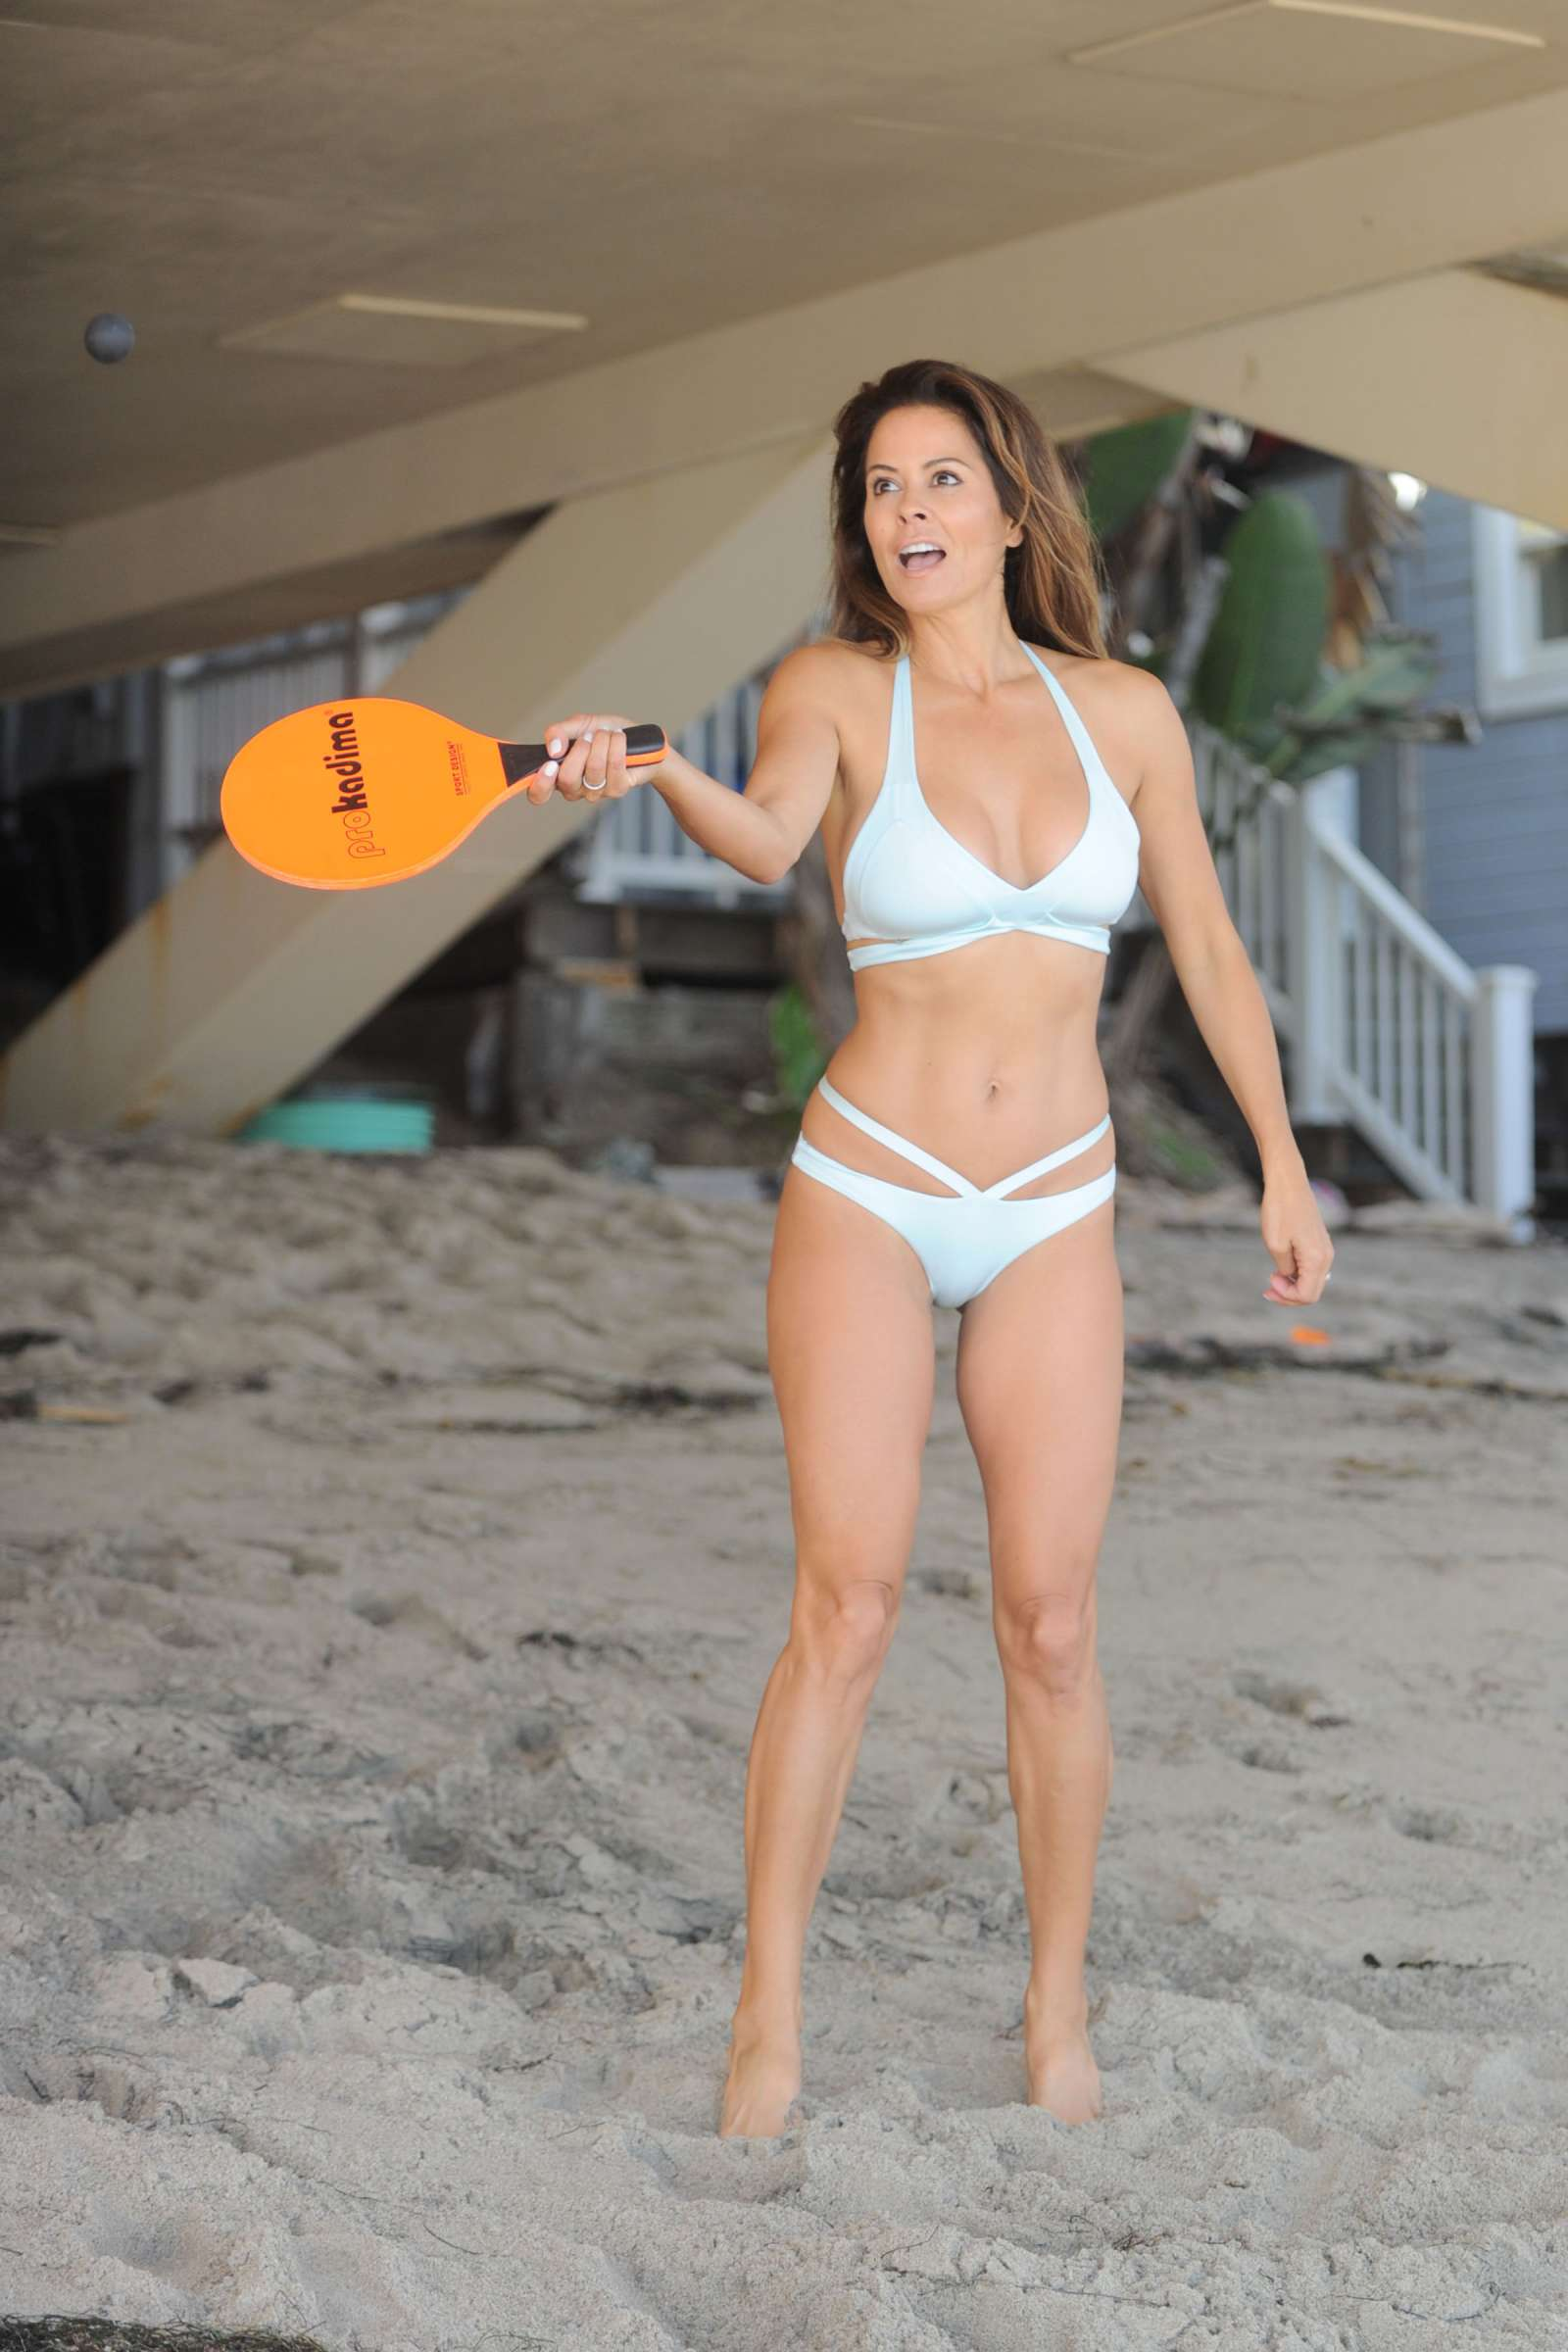 Brooke Burke in Bikini on the beach in Los Angeles